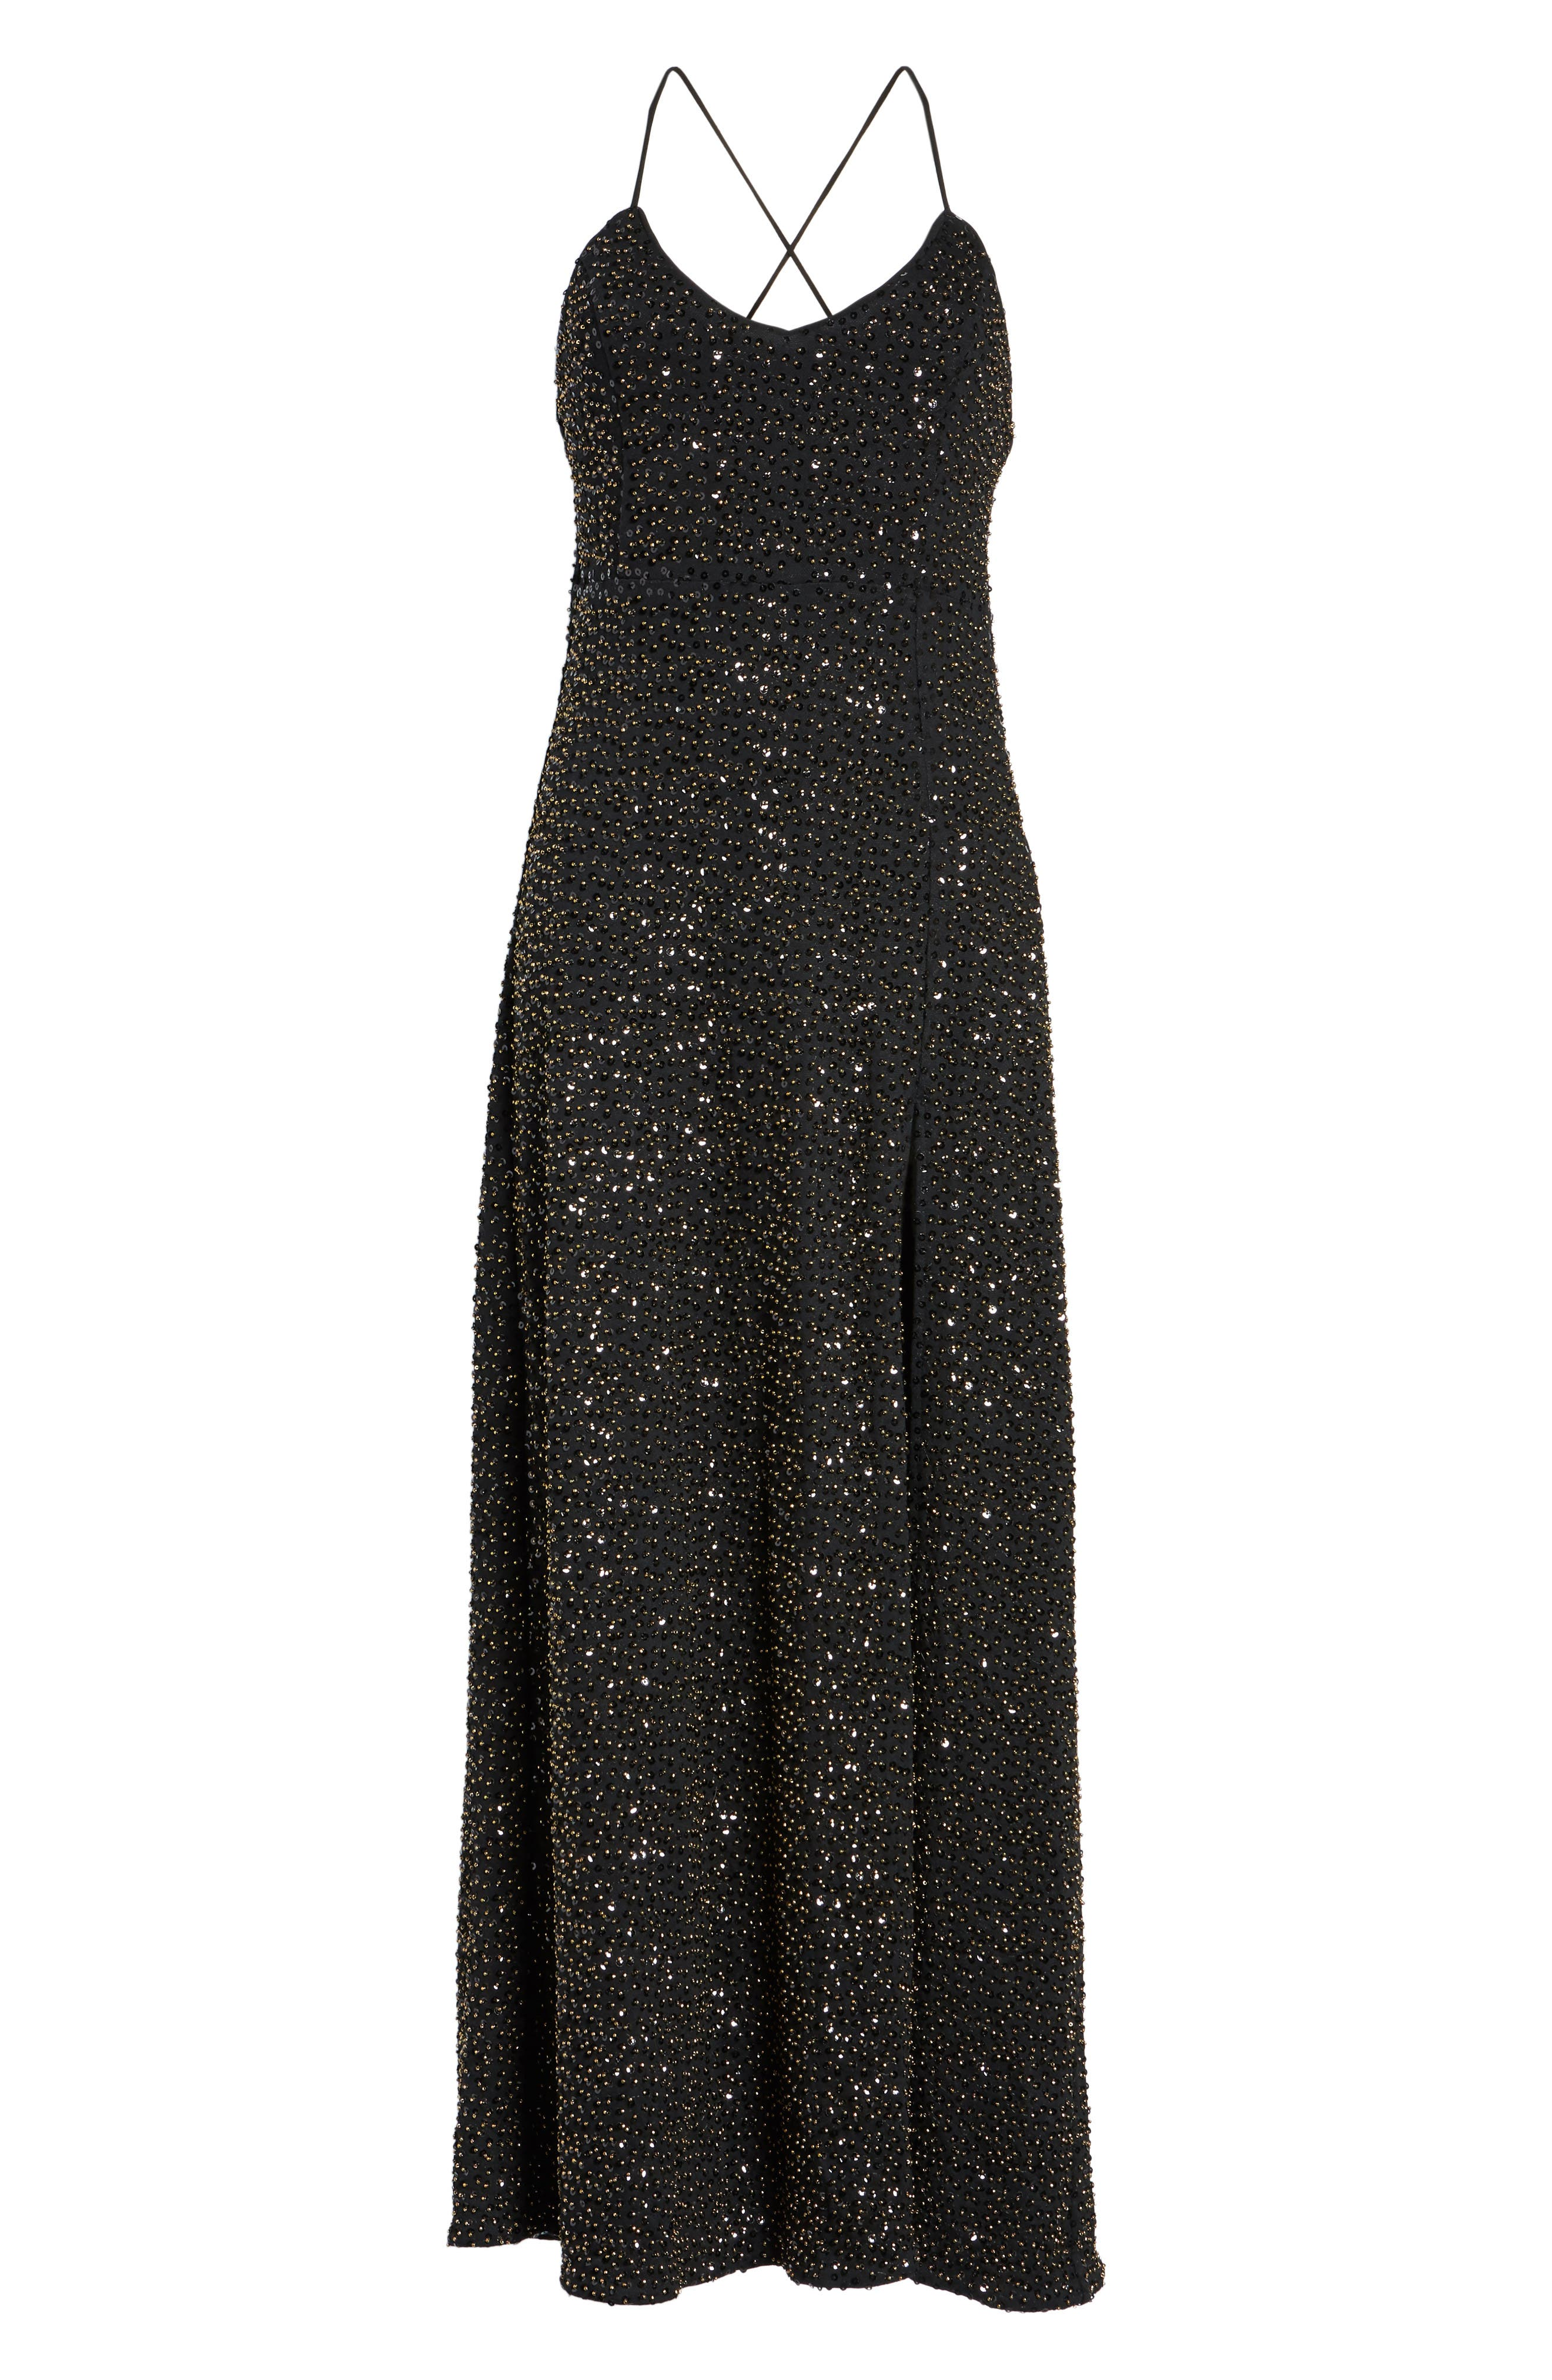 Gracen Maxi Dress,                             Alternate thumbnail 6, color,                             Black/ Brass